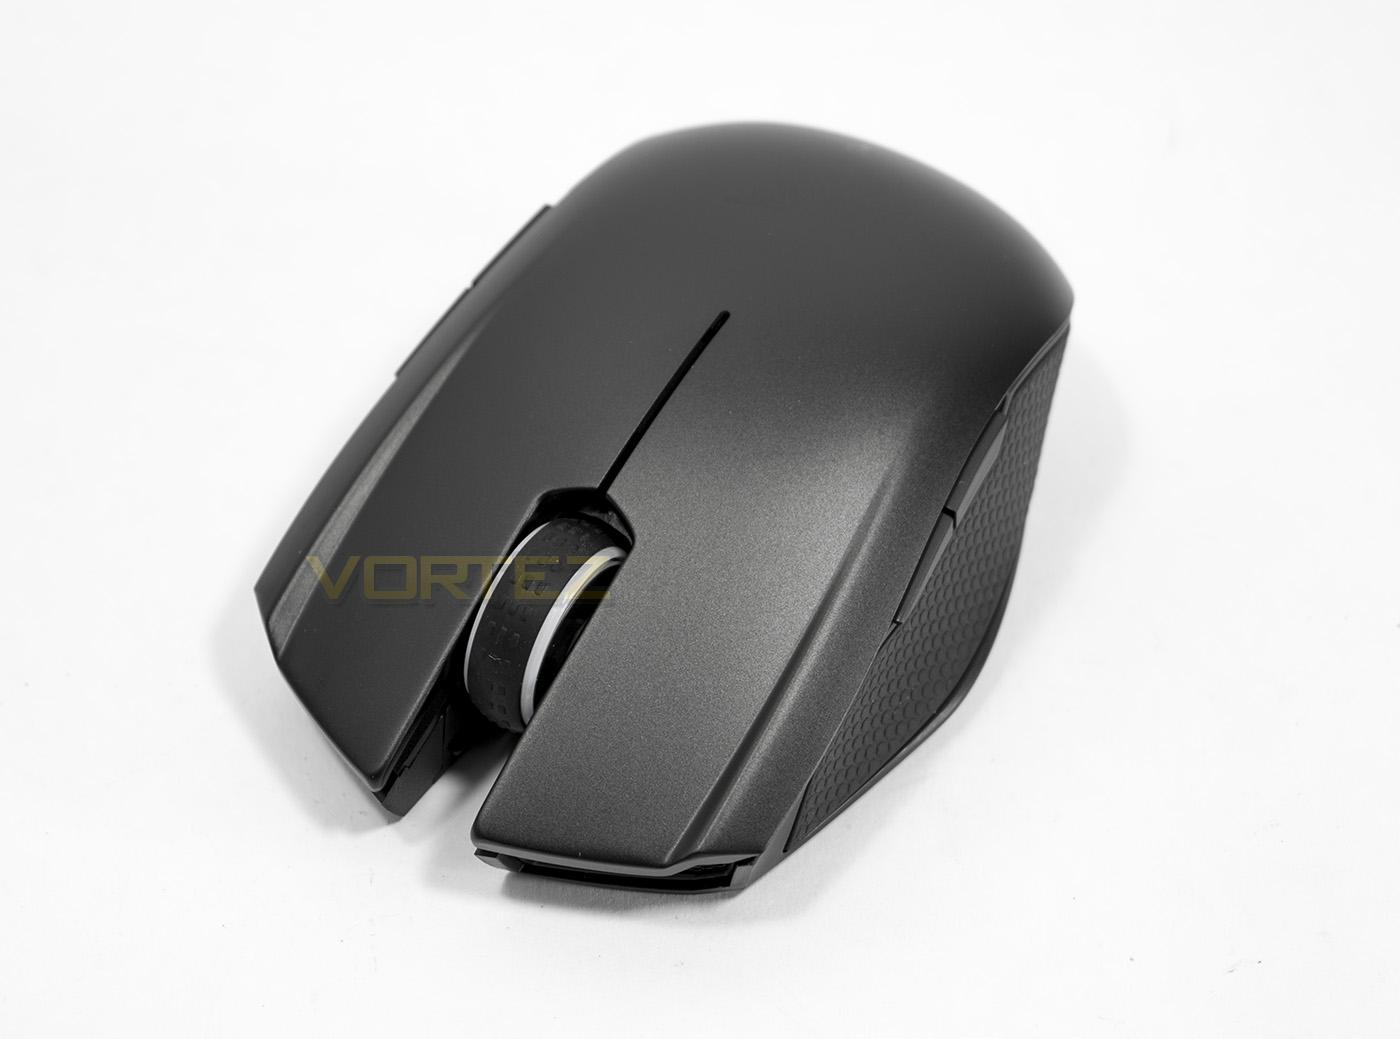 Razer Orochi Master Guide Mouse Ouroboros Black 2015 Review Introduction Rh Vortez Net Mamba